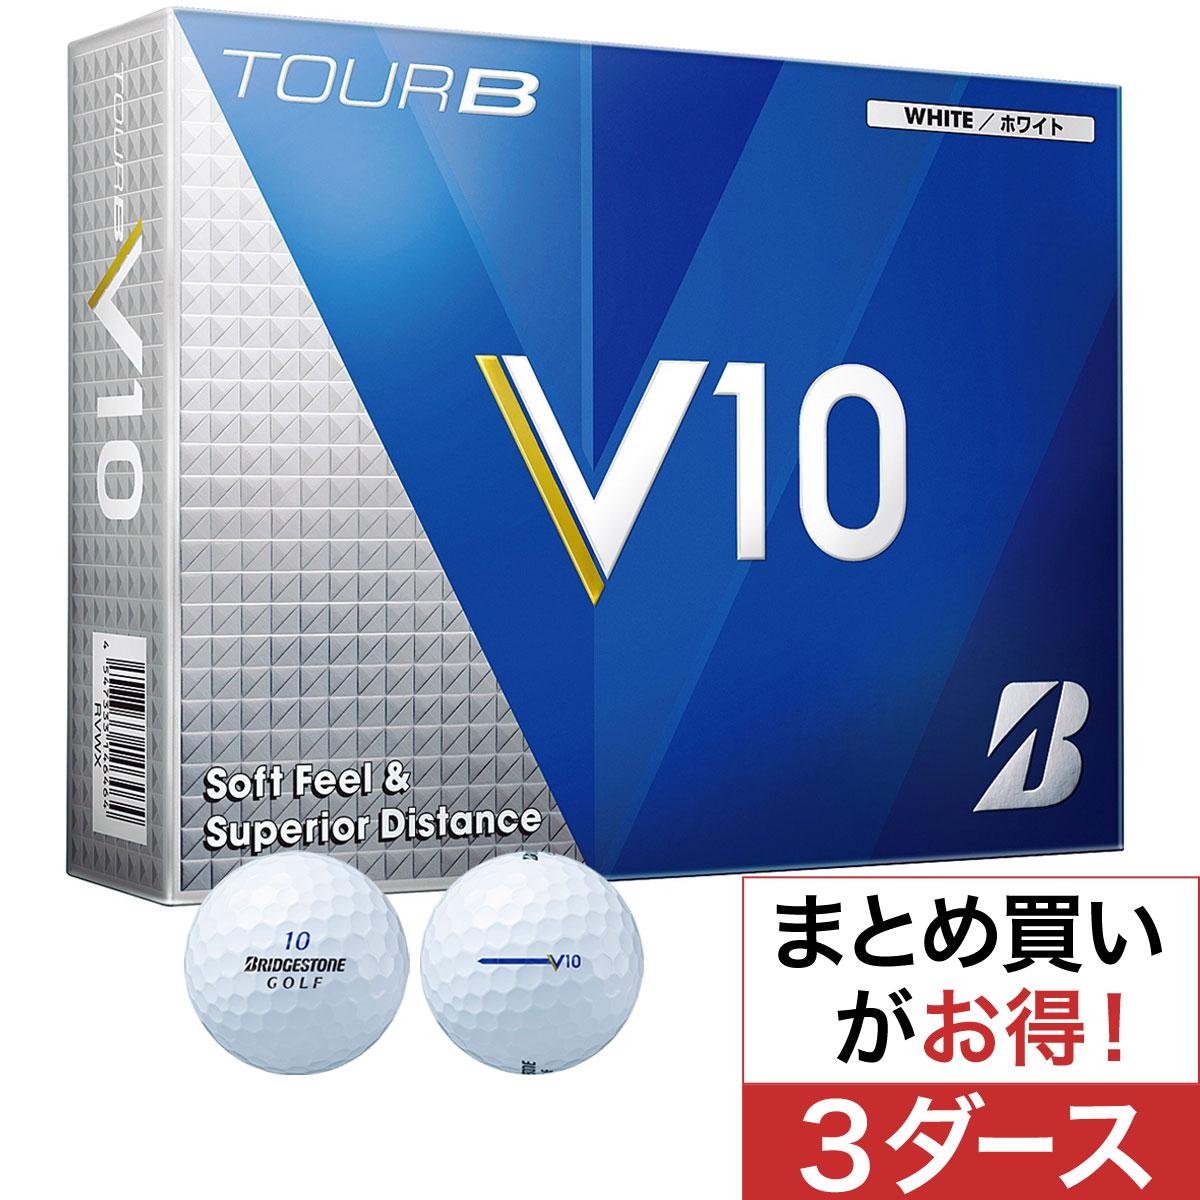 TOUR B V10 ボール 3ダースセット